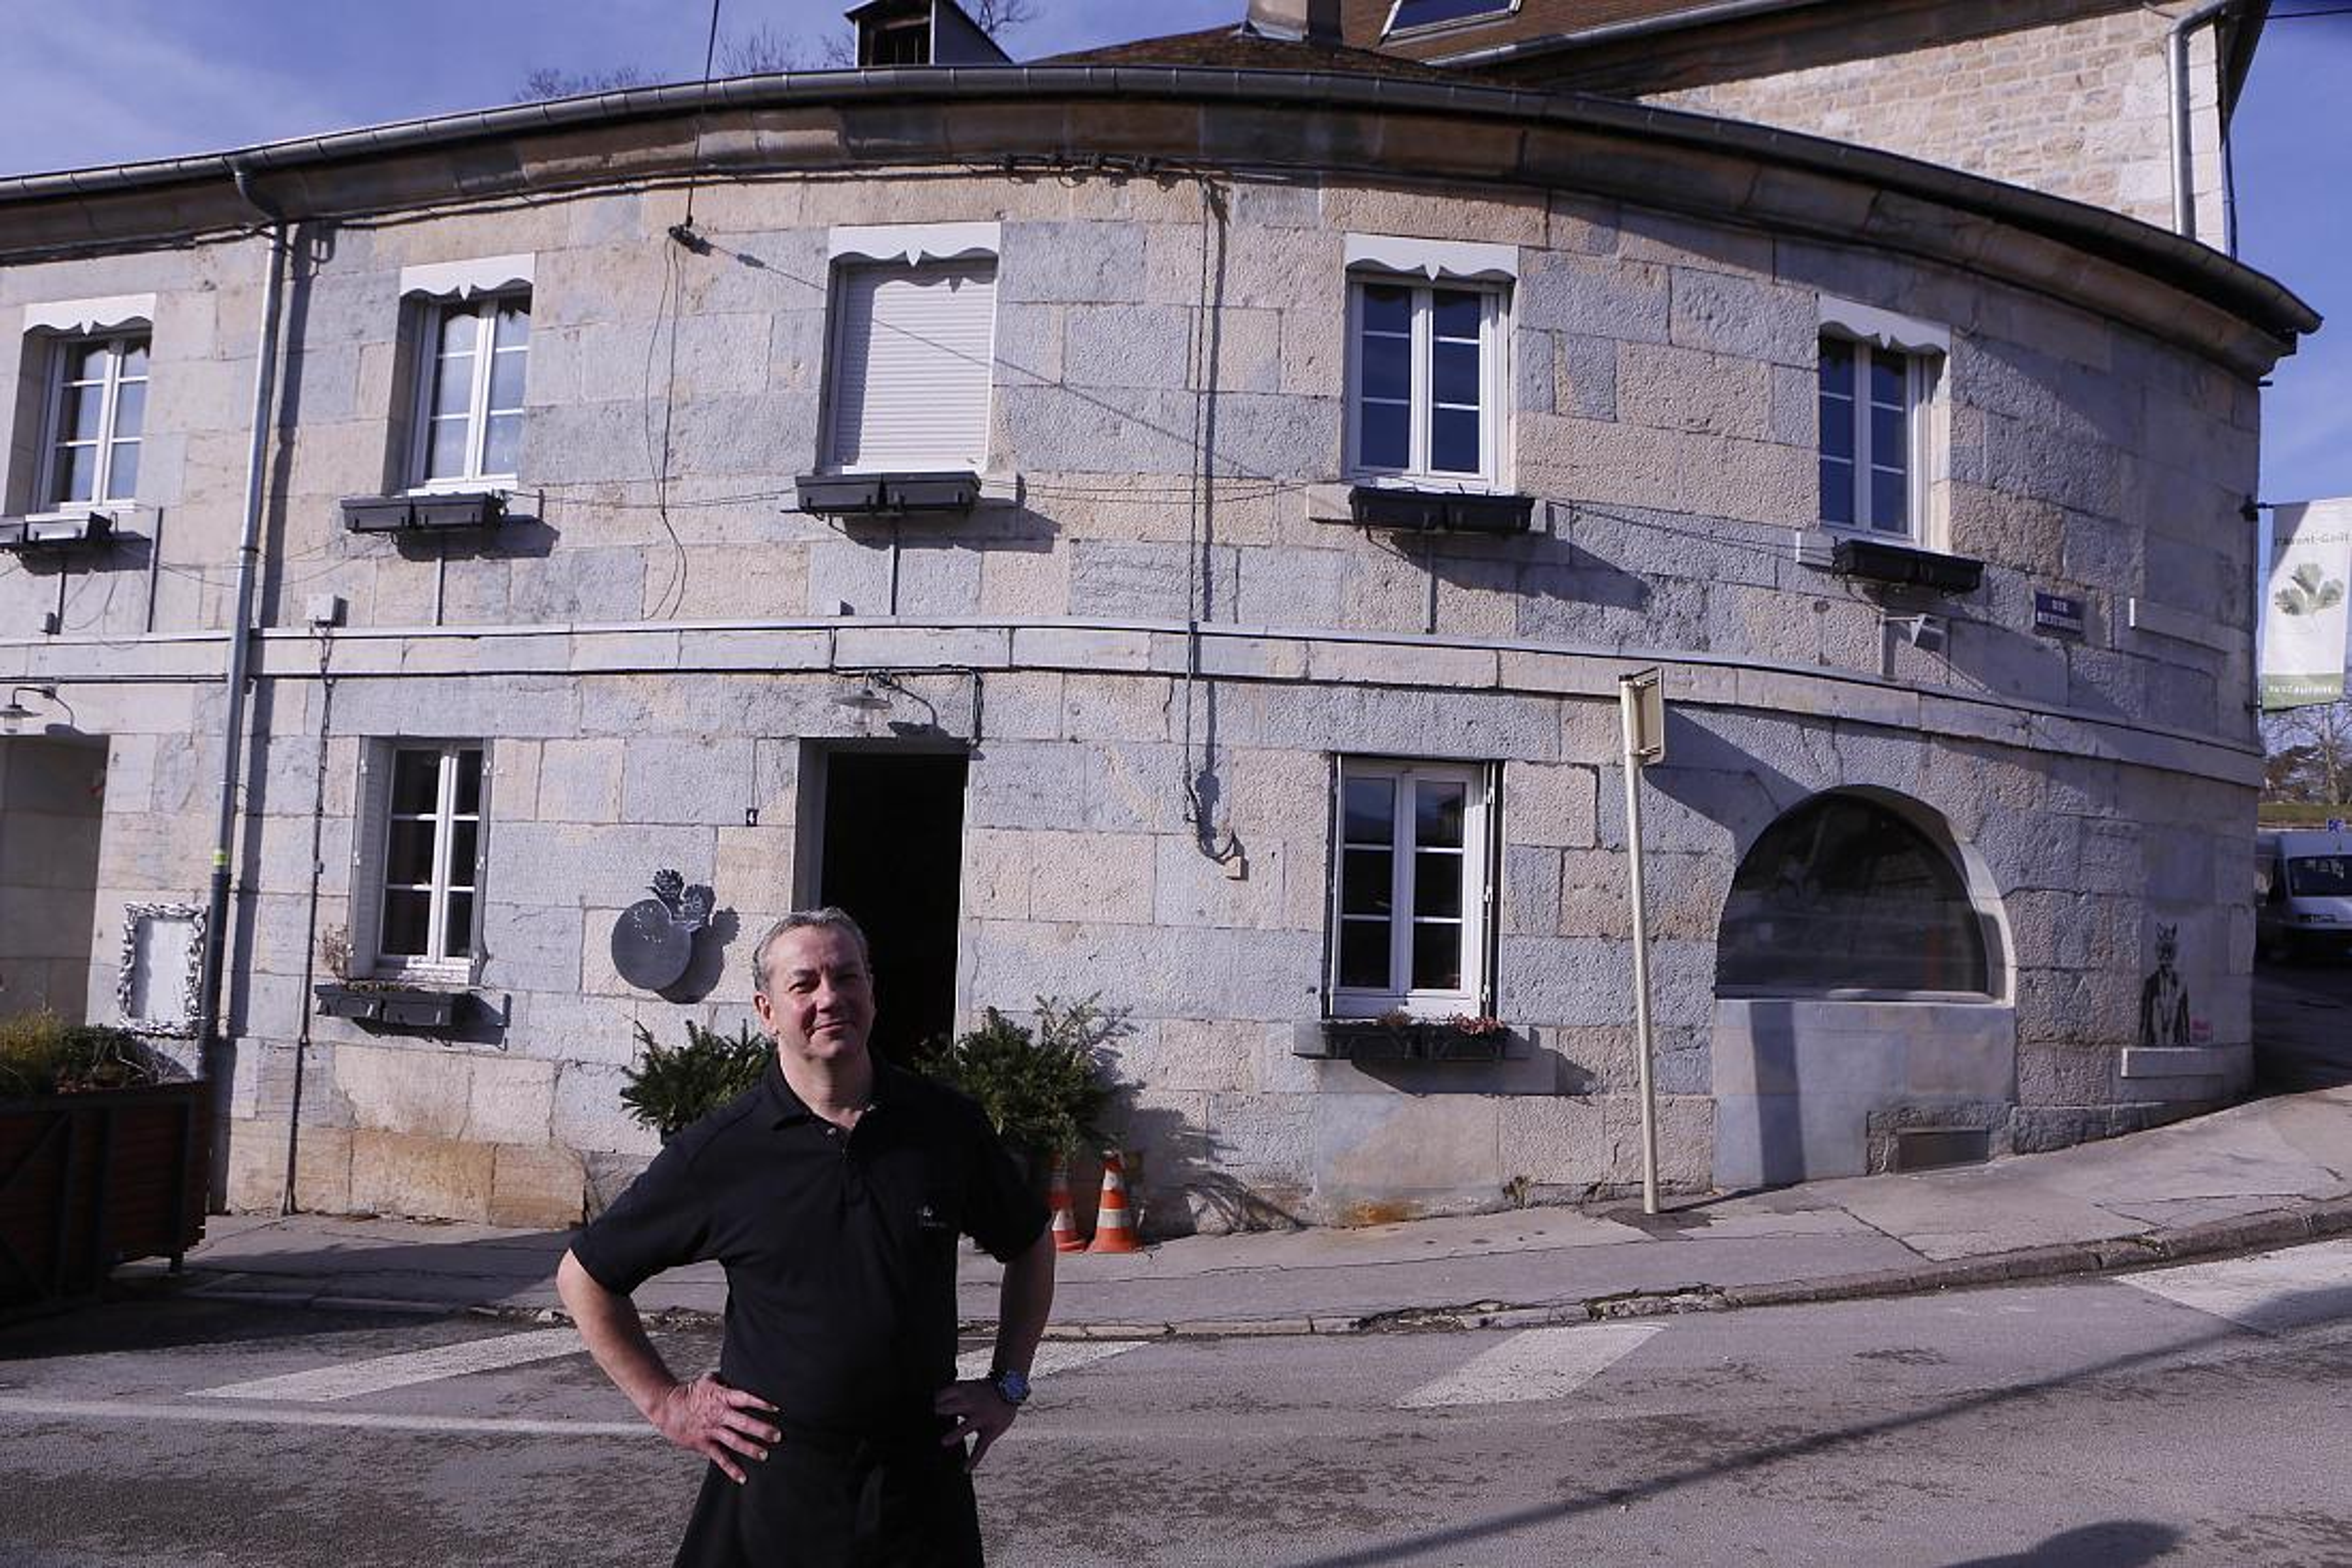 Thierry devant sa maison ©Maurice Rougemont